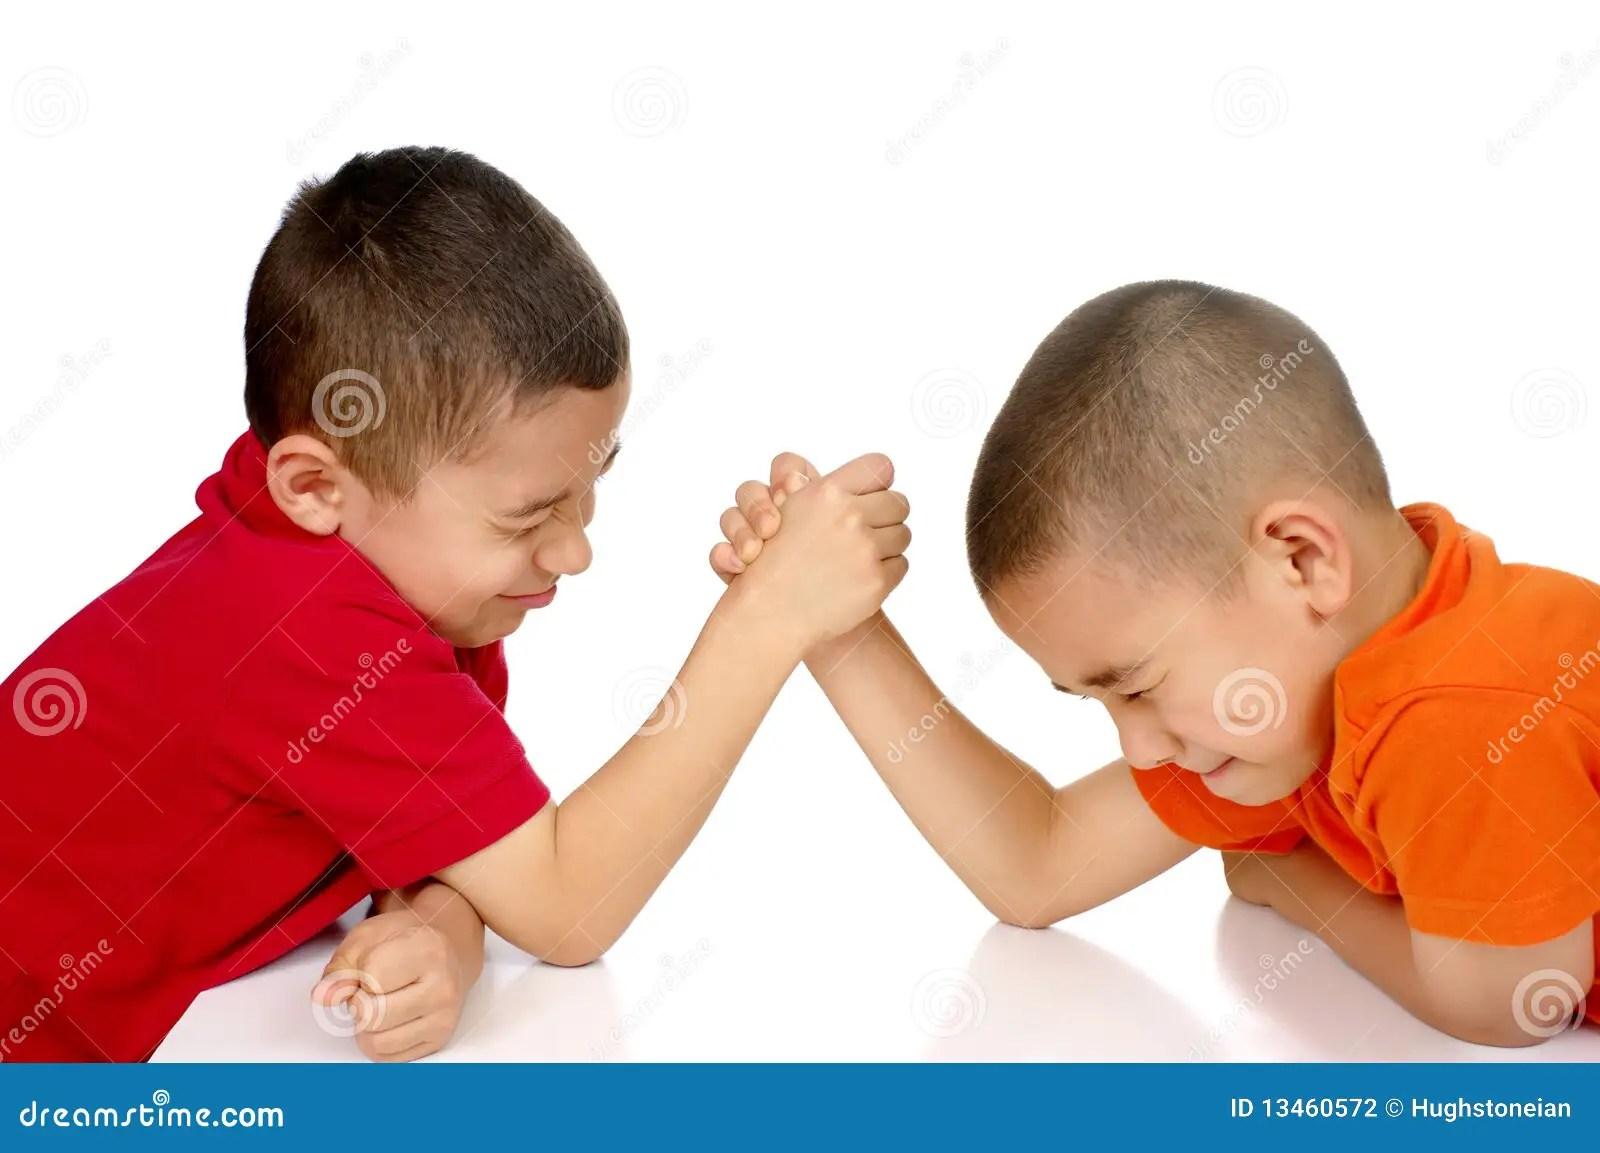 Kids Arm Wrestling Stock Photography